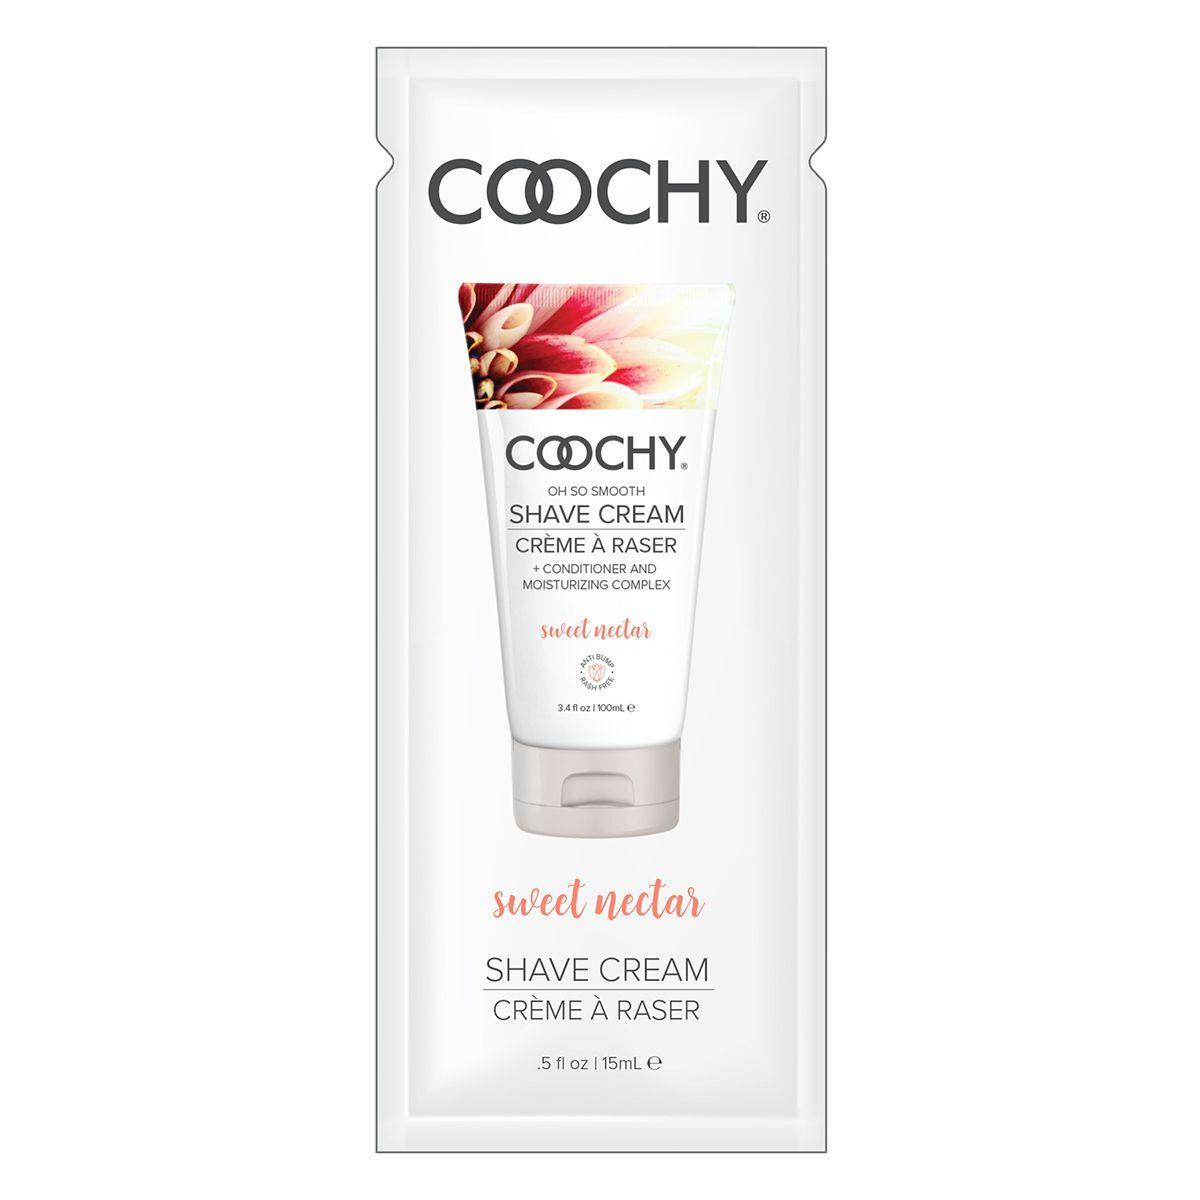 Увлажняющий комплекс COOCHY Sweet Nectar - 15 мл.-7606